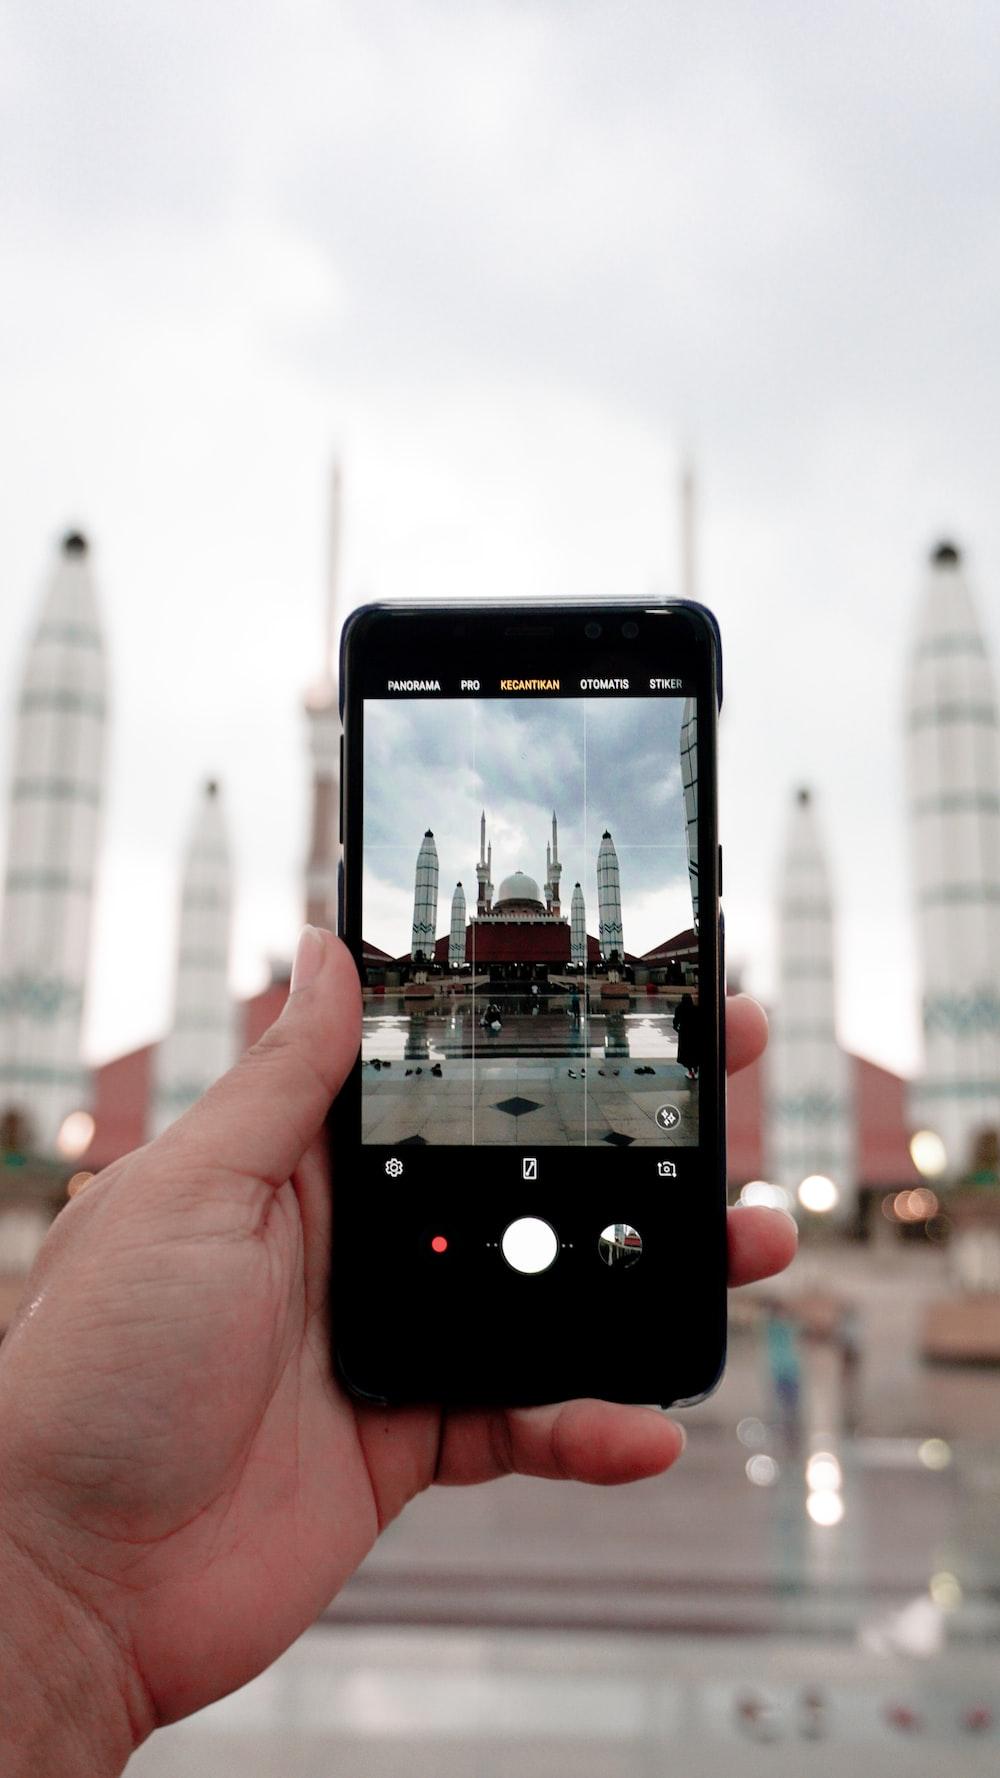 Masjid Agung Jawa Tengah Semarang Indonesia Pictures Download